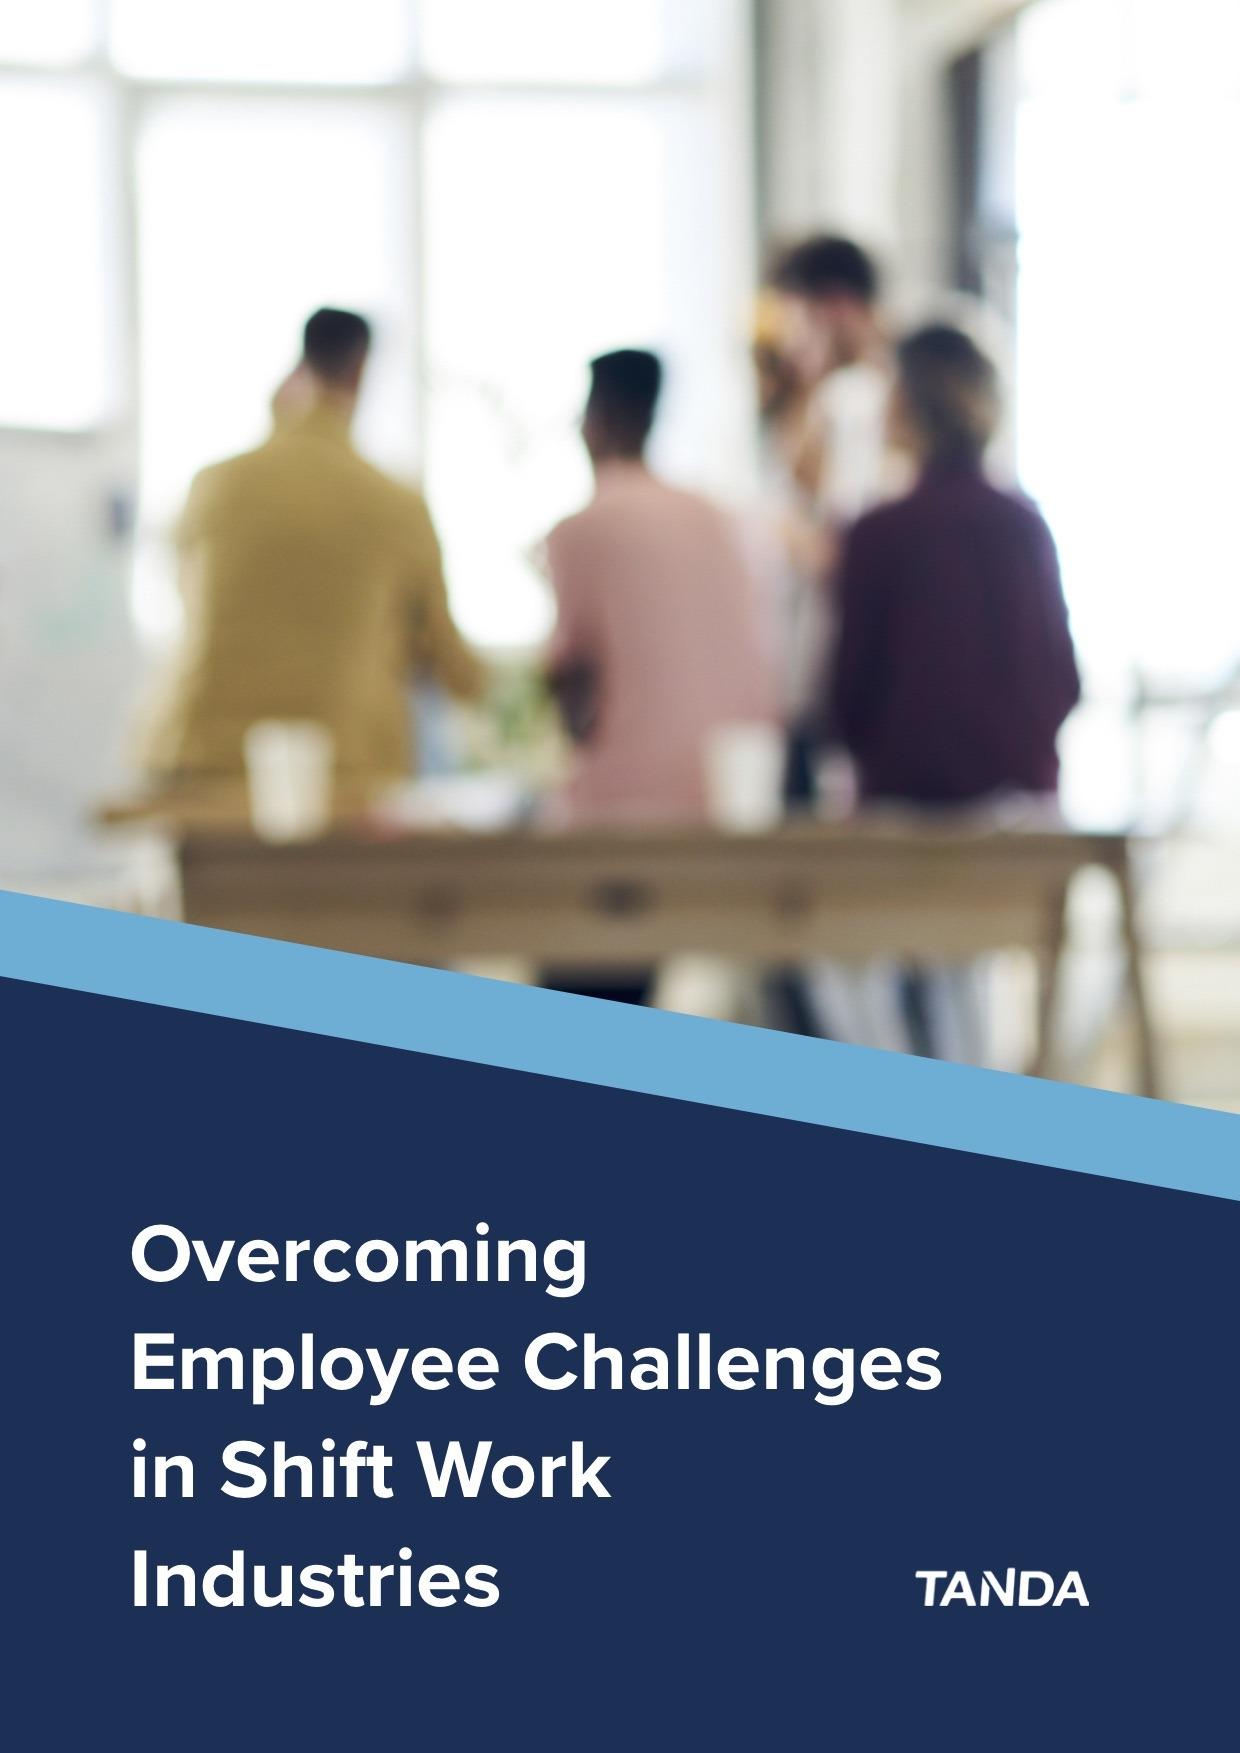 Overcoming Employee Challenges in Shift Work Industries